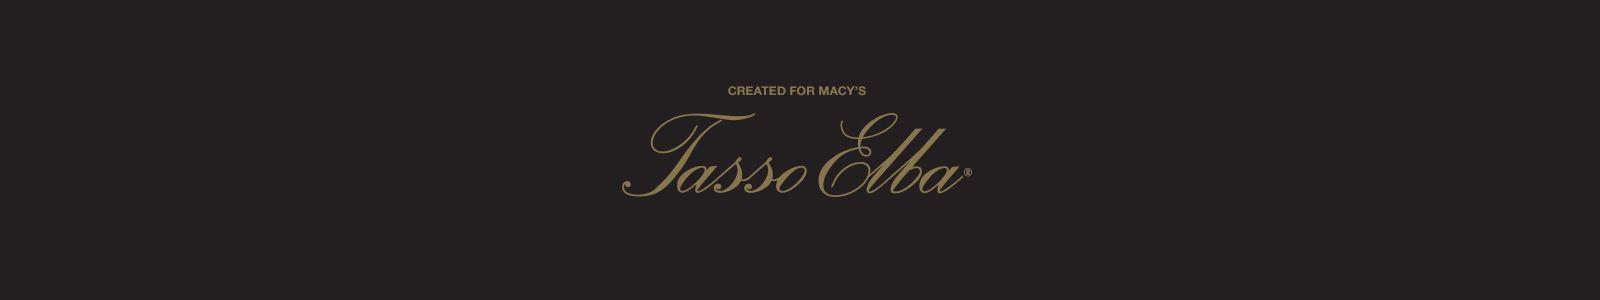 Created for Macy's, Tasso Elba